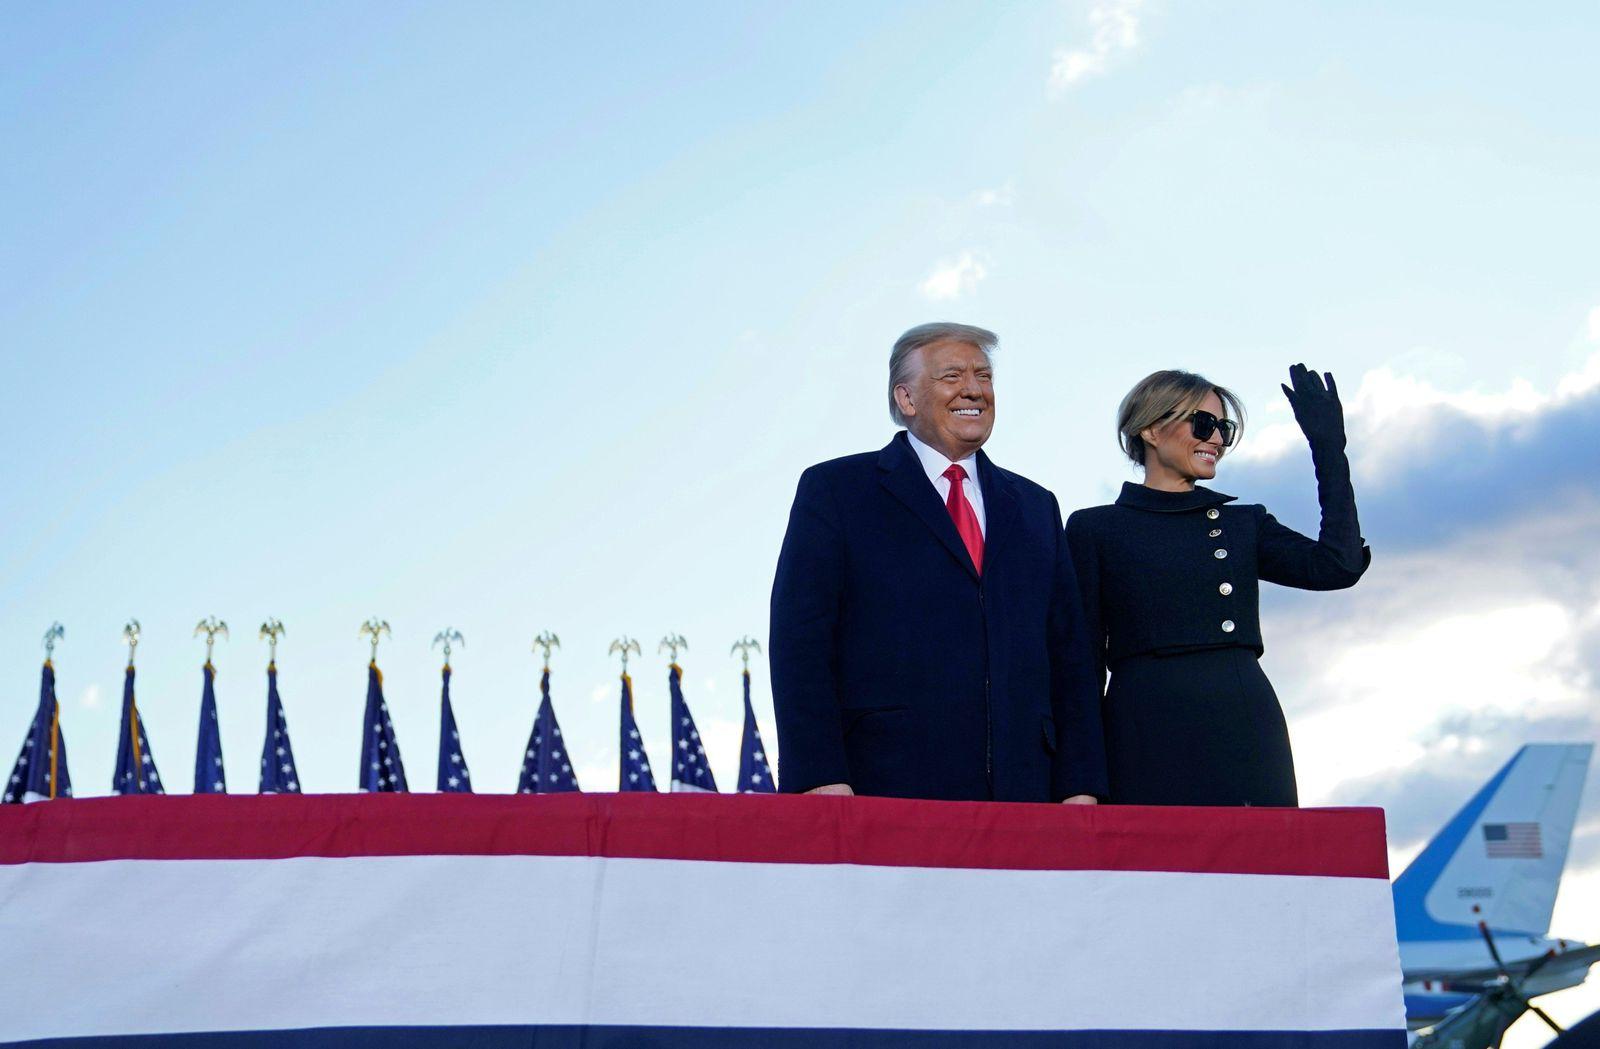 US-POLITICS-DEPARTURE-TRUMP